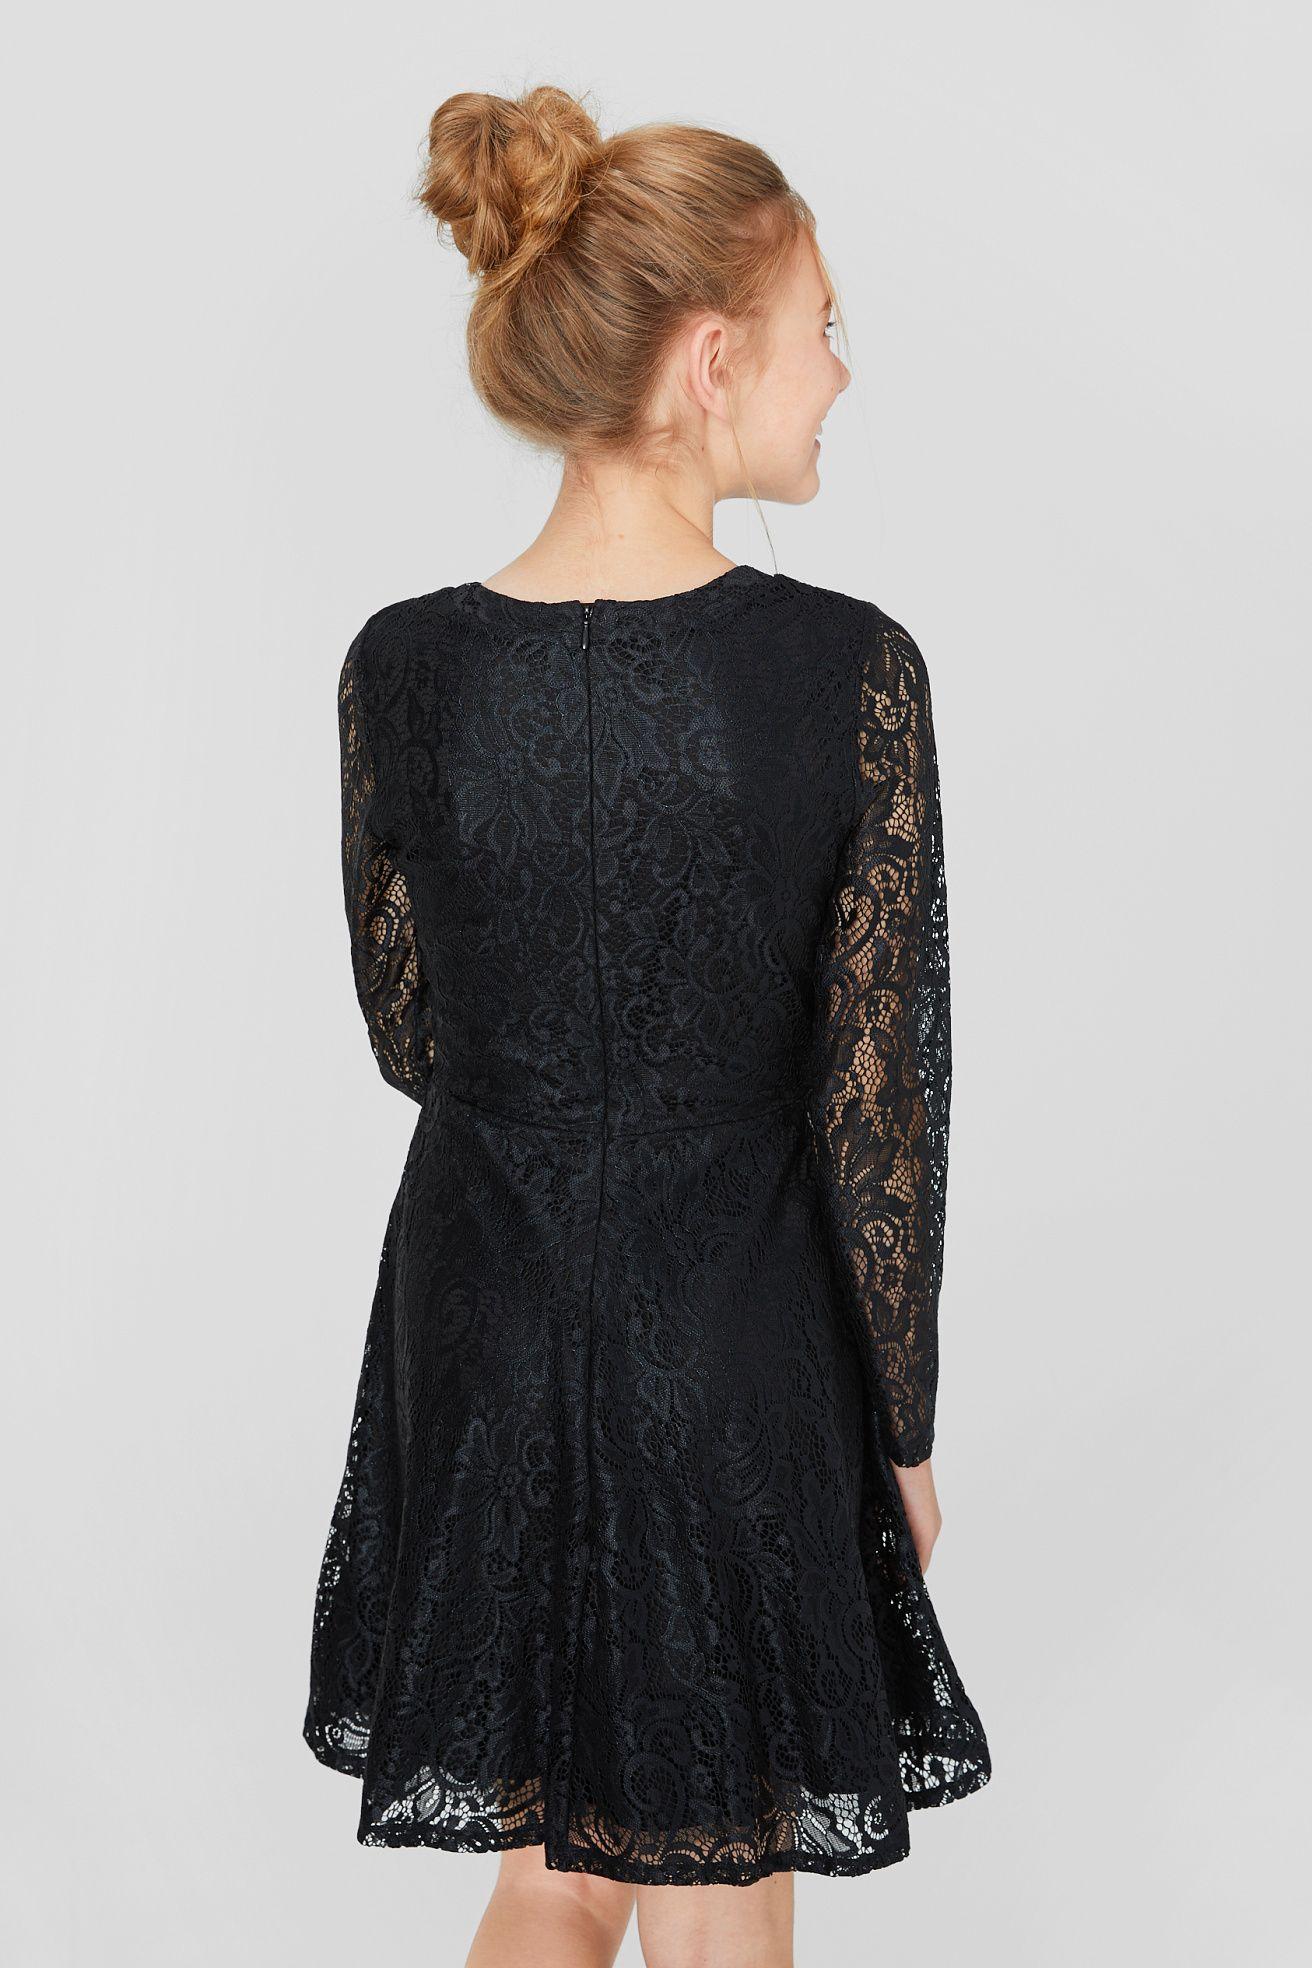 Kleid Kleider Modestil Formelle Kleider